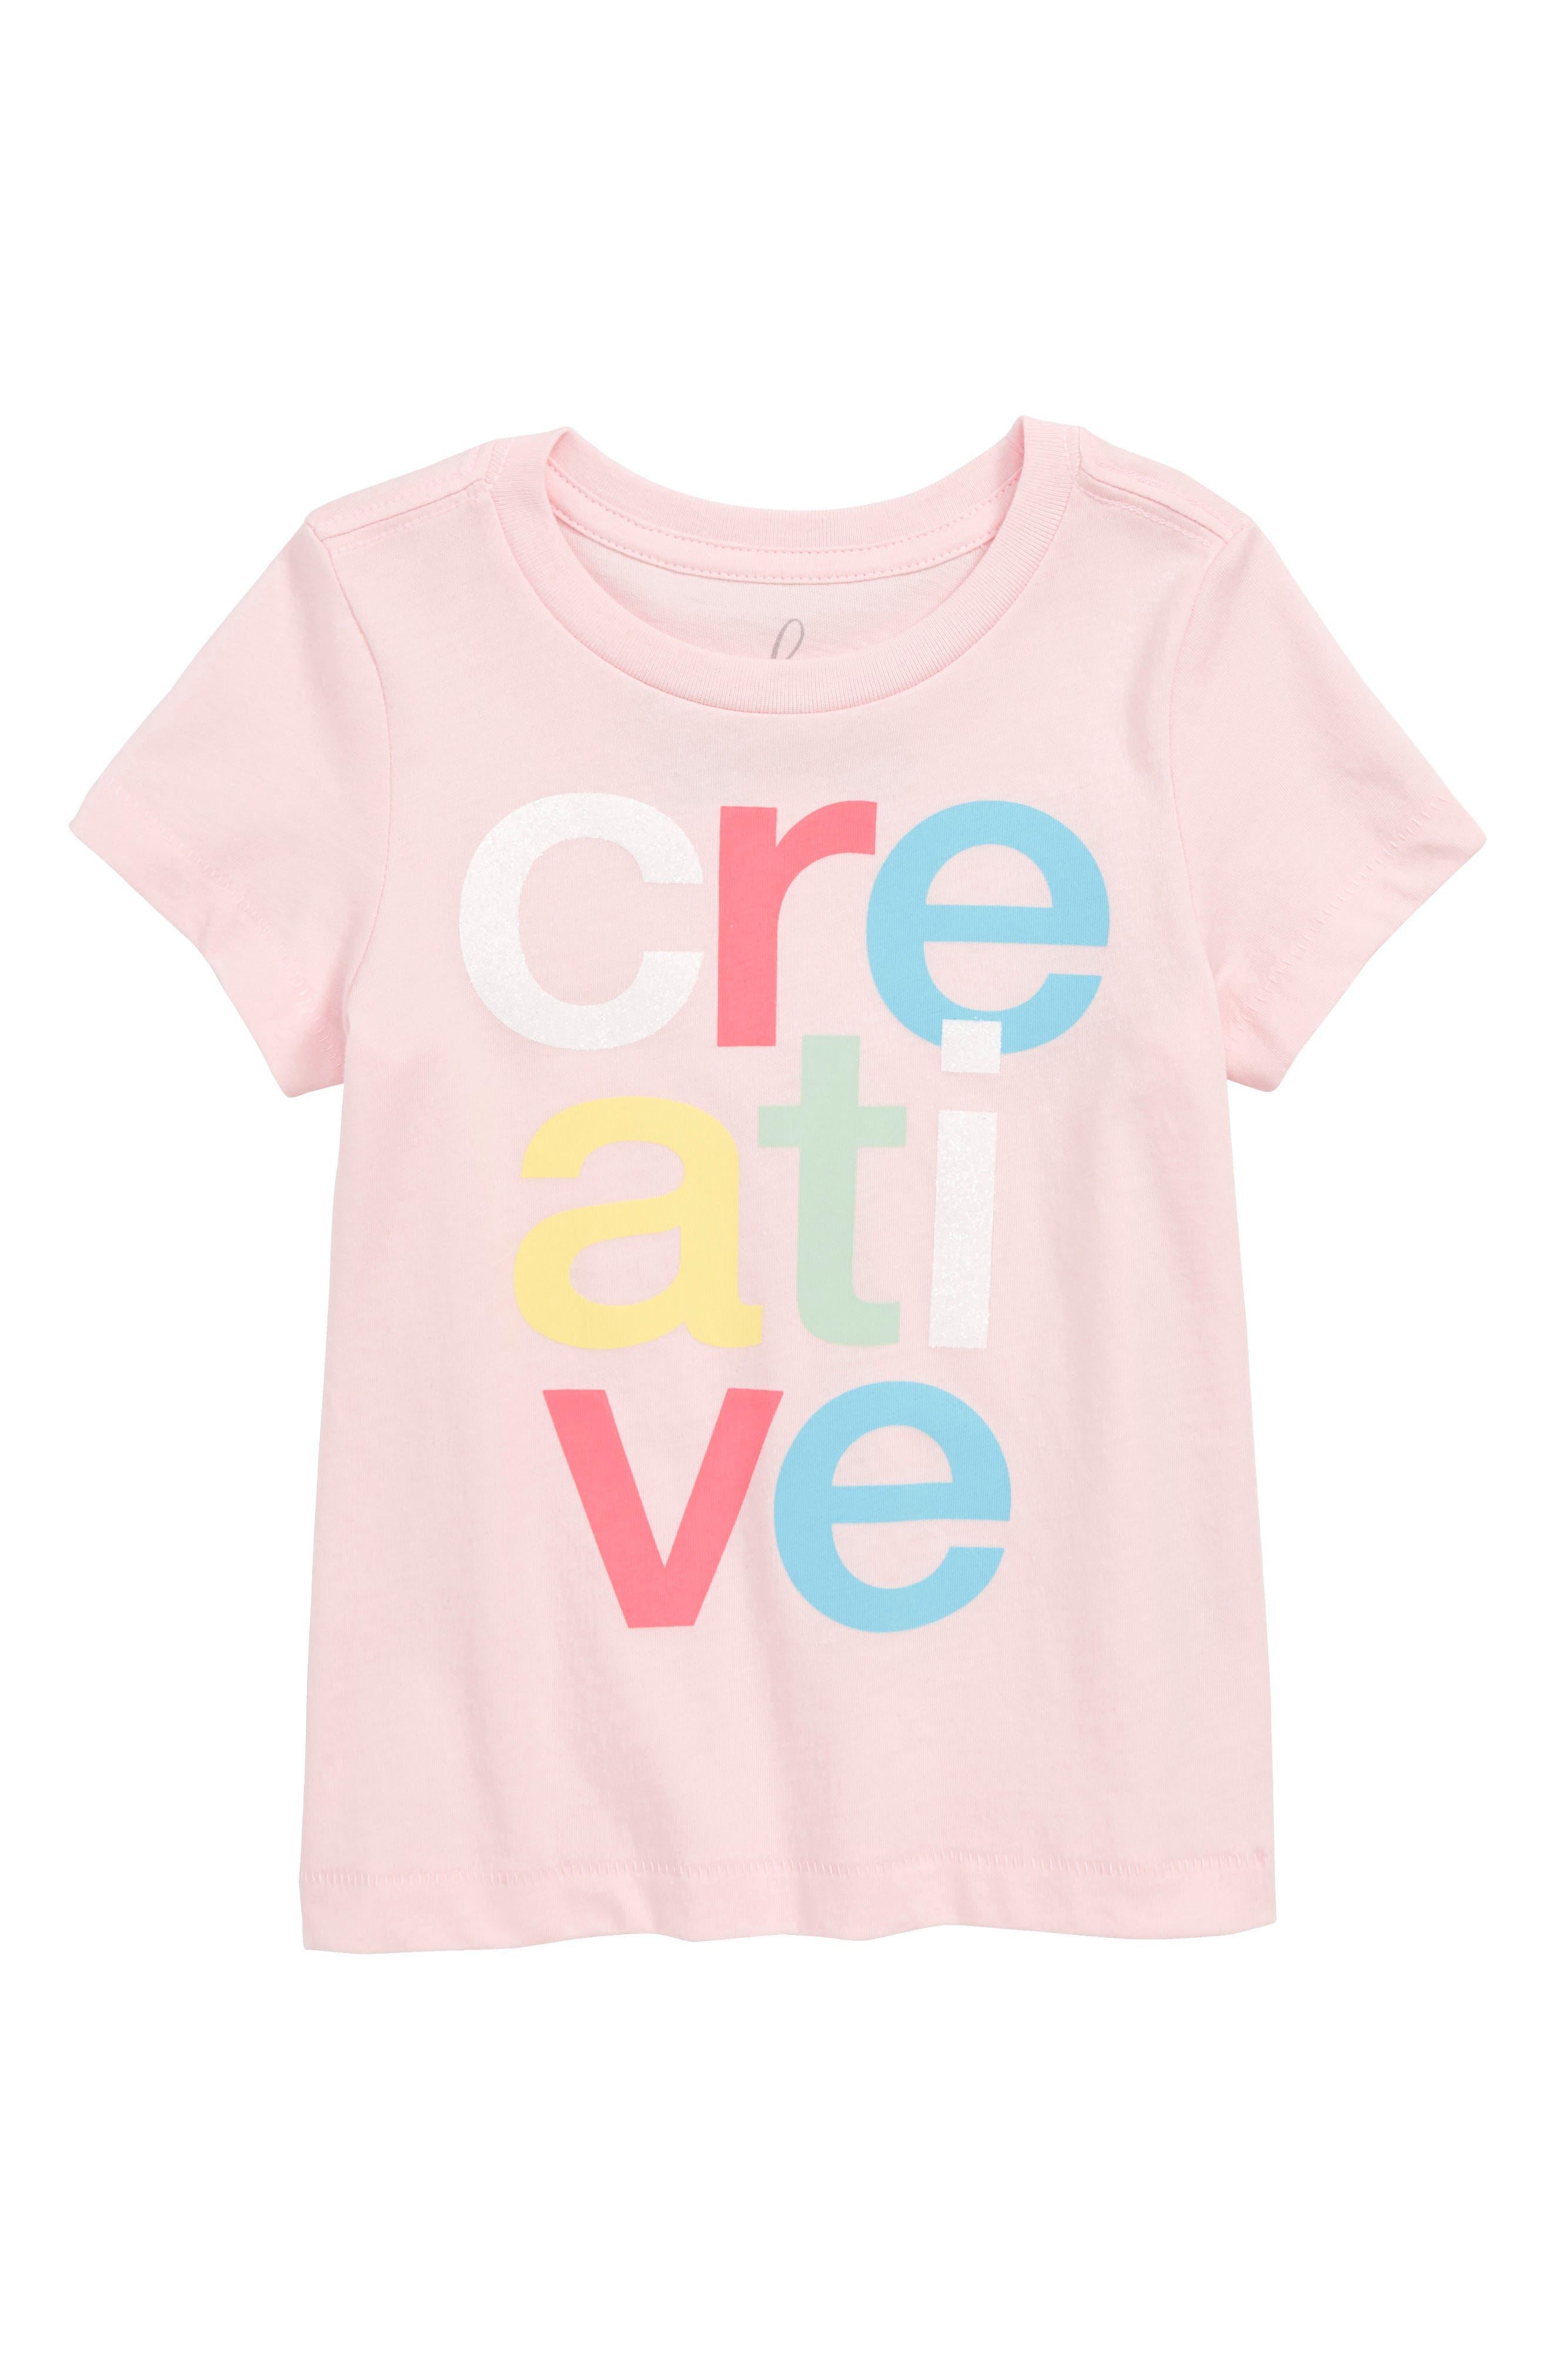 Creative Tee,                         Main,                         color, LIGHT PINK